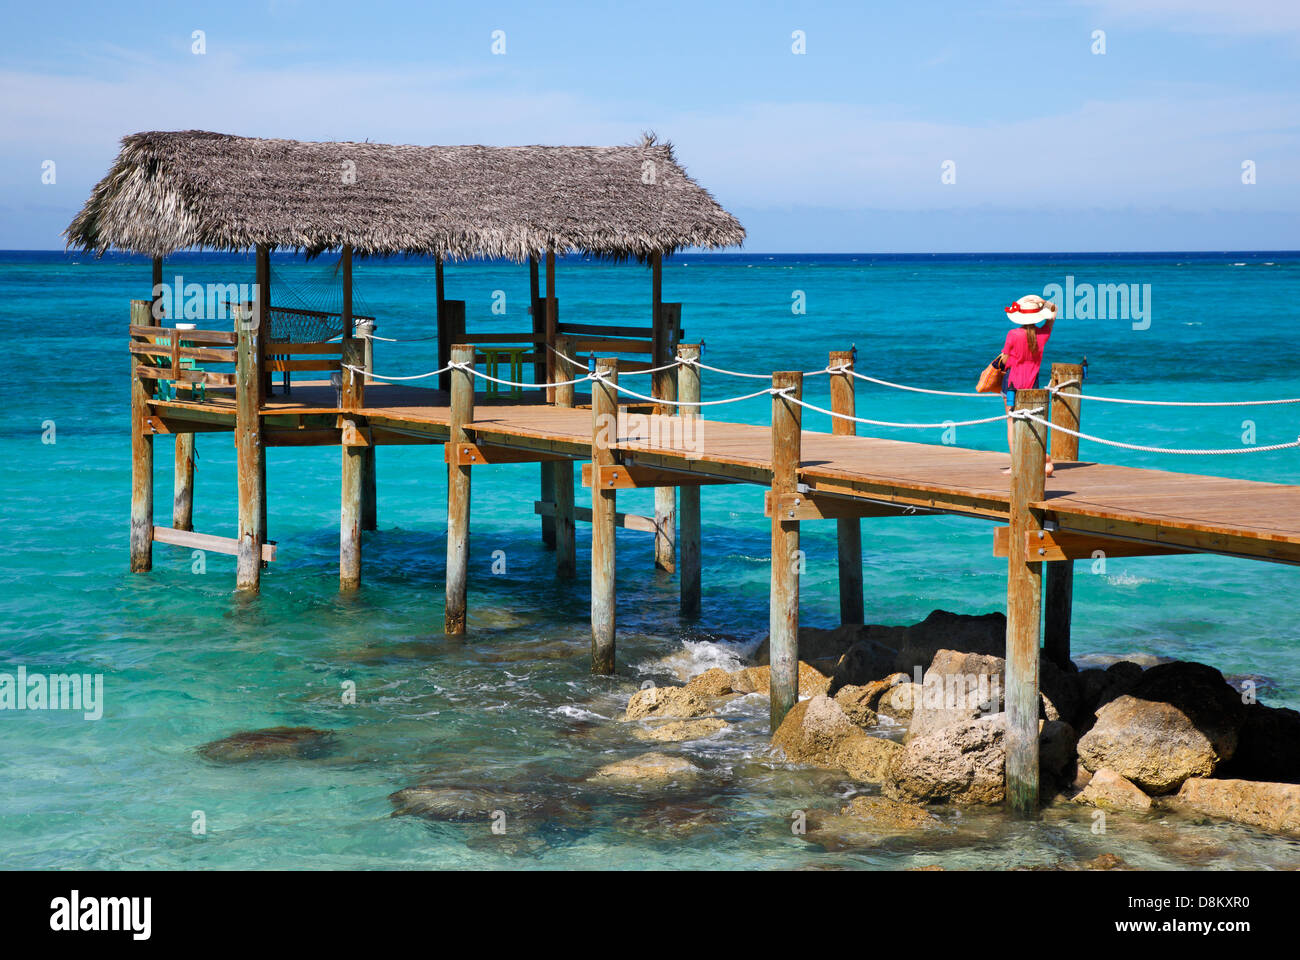 Compass point, Nassau Bahamas. - Stock Image